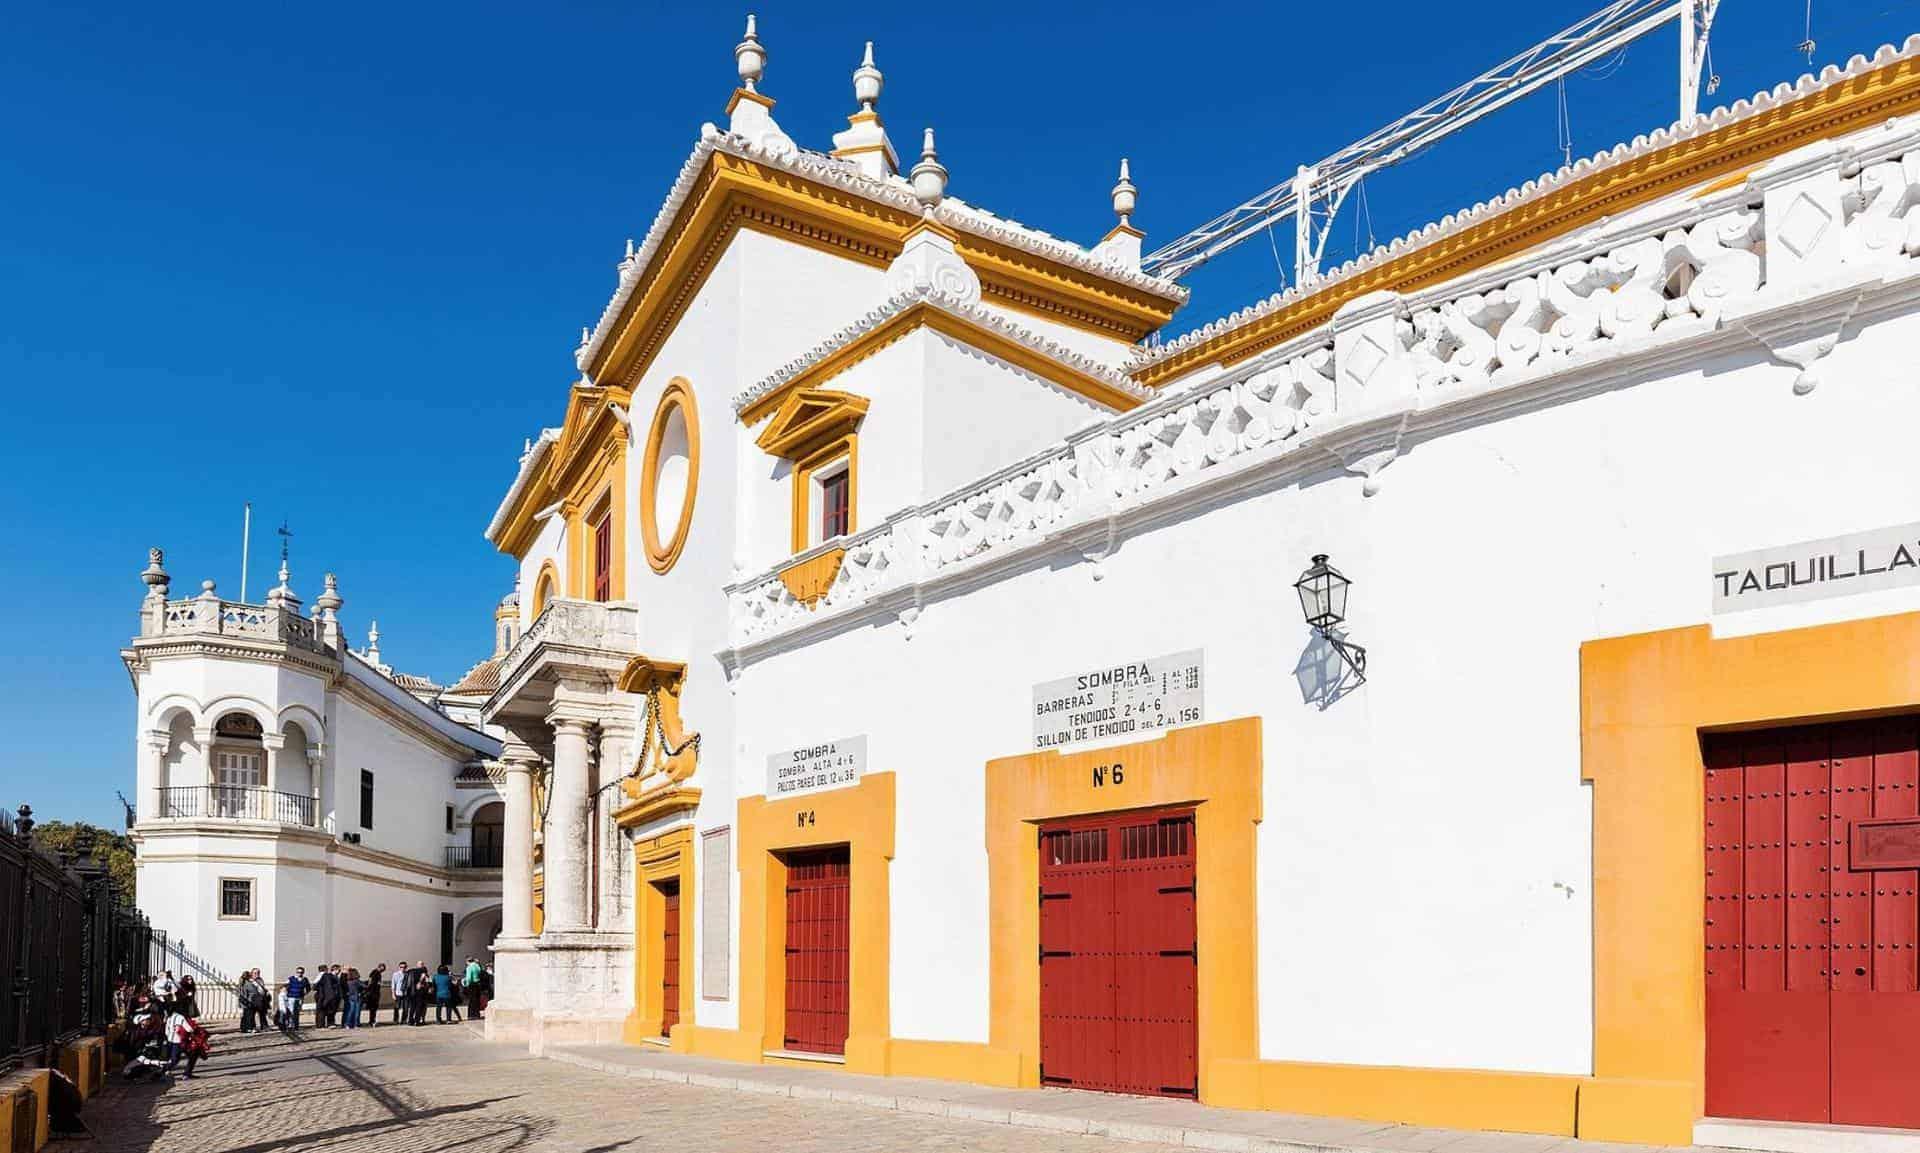 essential_seville_point13_Plaza de Toros de la Maestranza